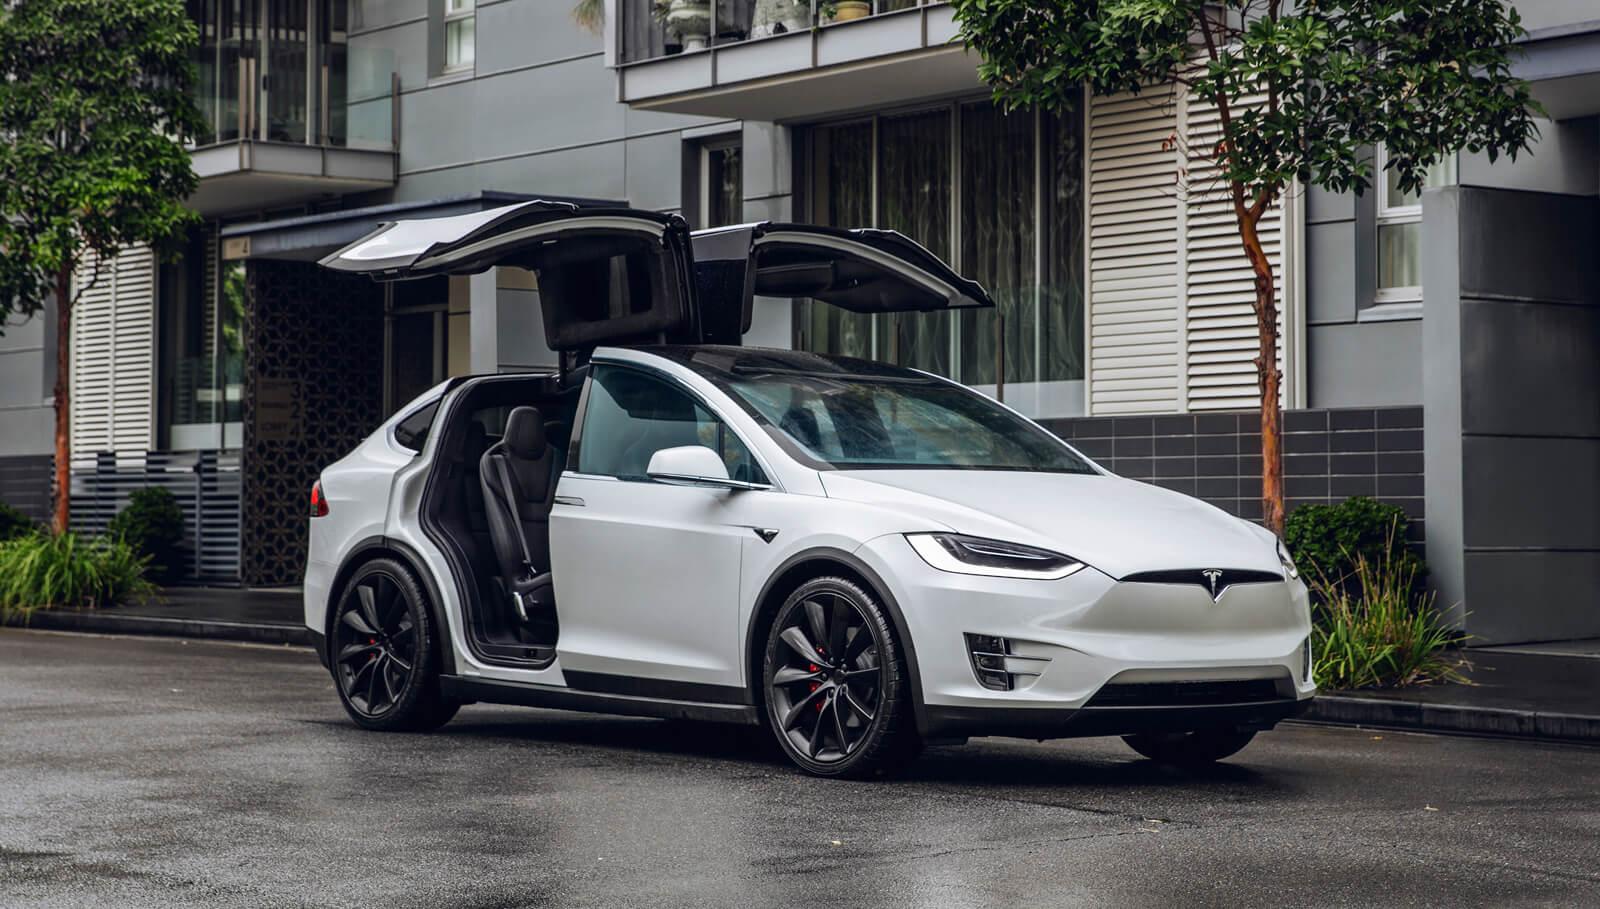 Tesla Model X Review 2020 Uk Price Electric Car Home